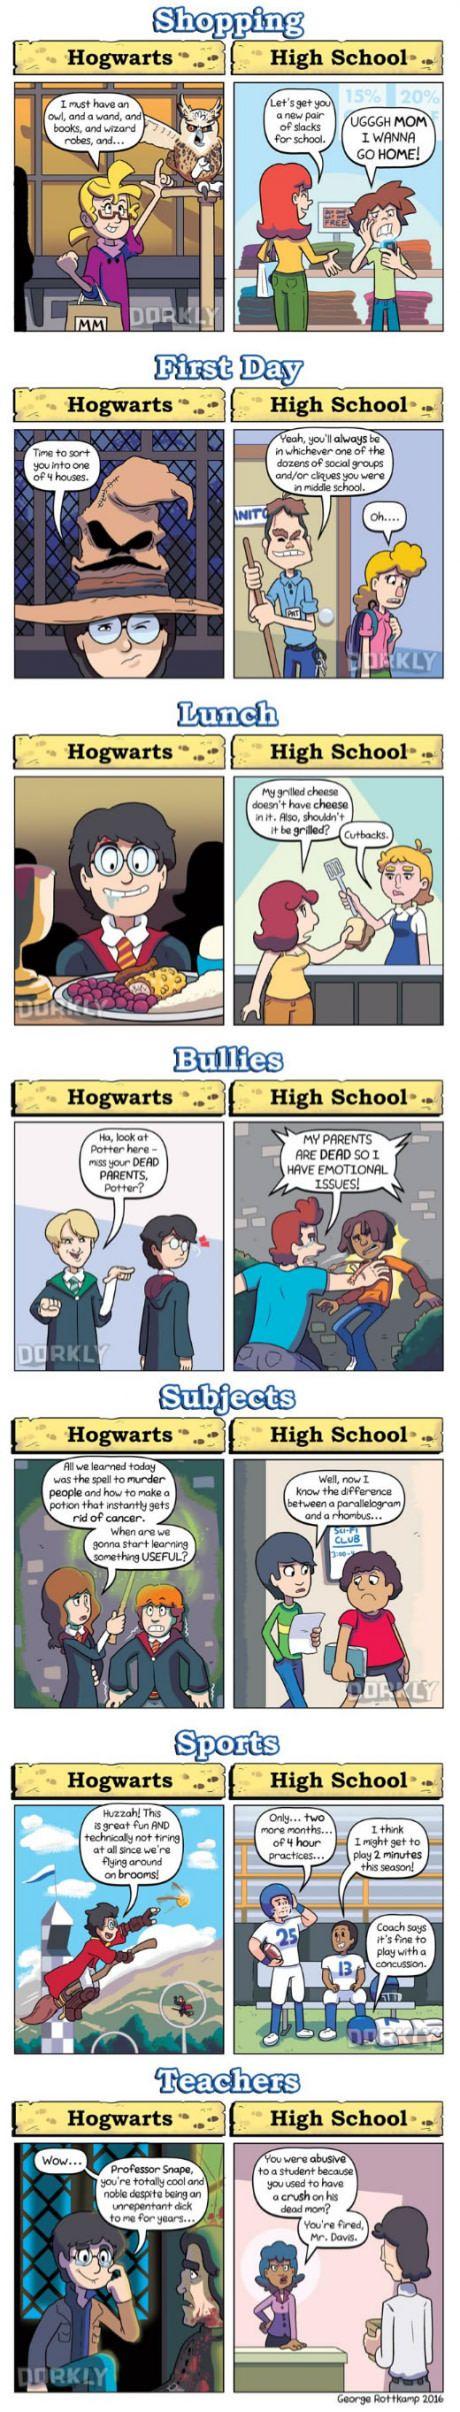 Harry Potter Schools vs. Real High School